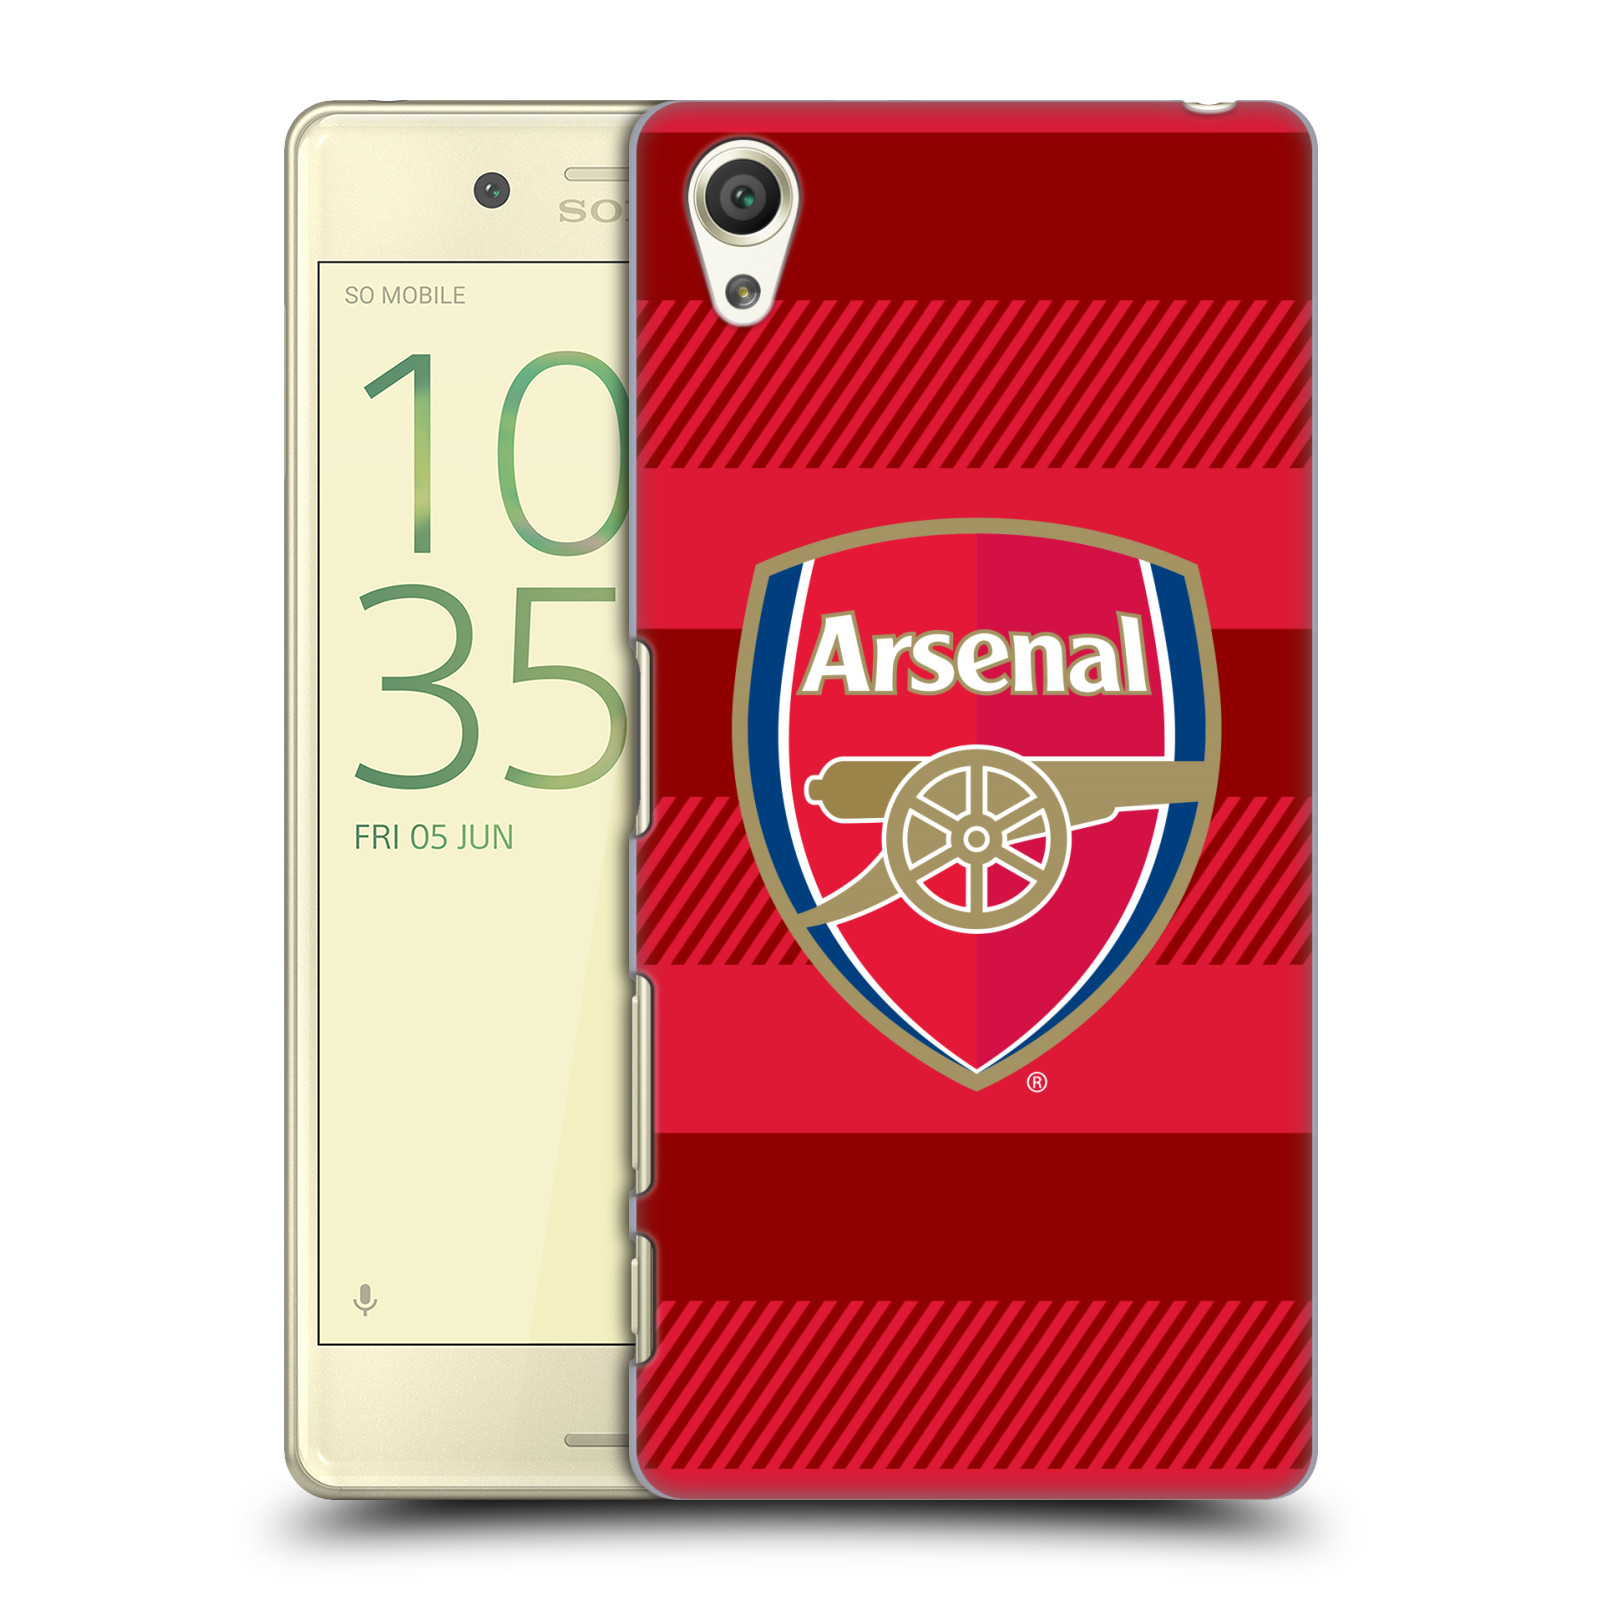 Plastové pouzdro na mobil Sony Xperia X - Head Case - Arsenal FC - Logo s pruhy